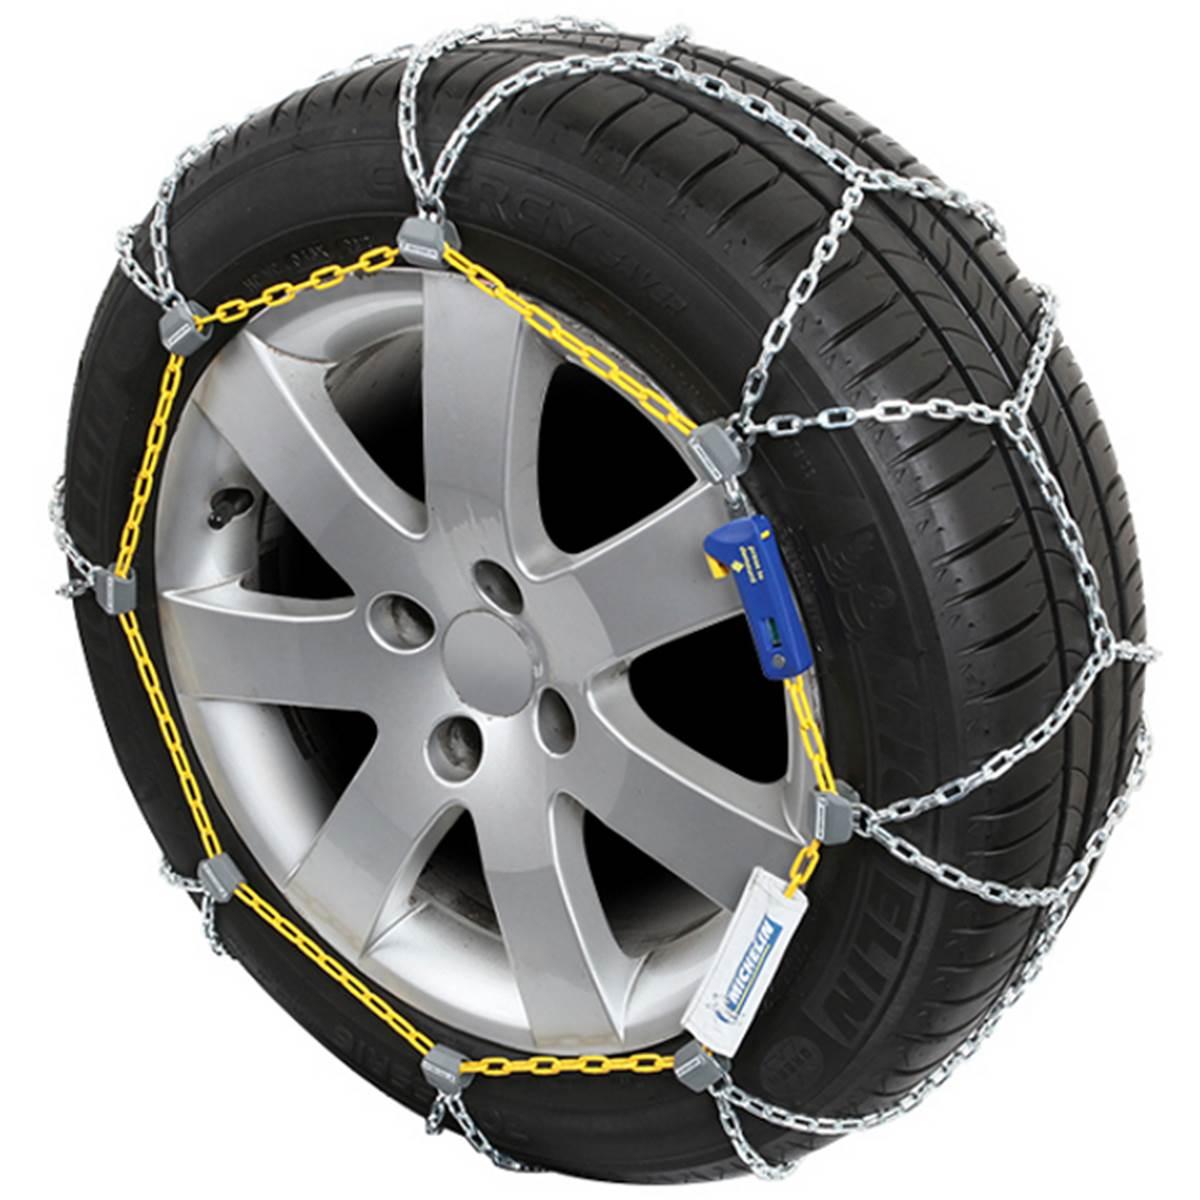 2 Chaînes neige Michelin elastic Chain MI60